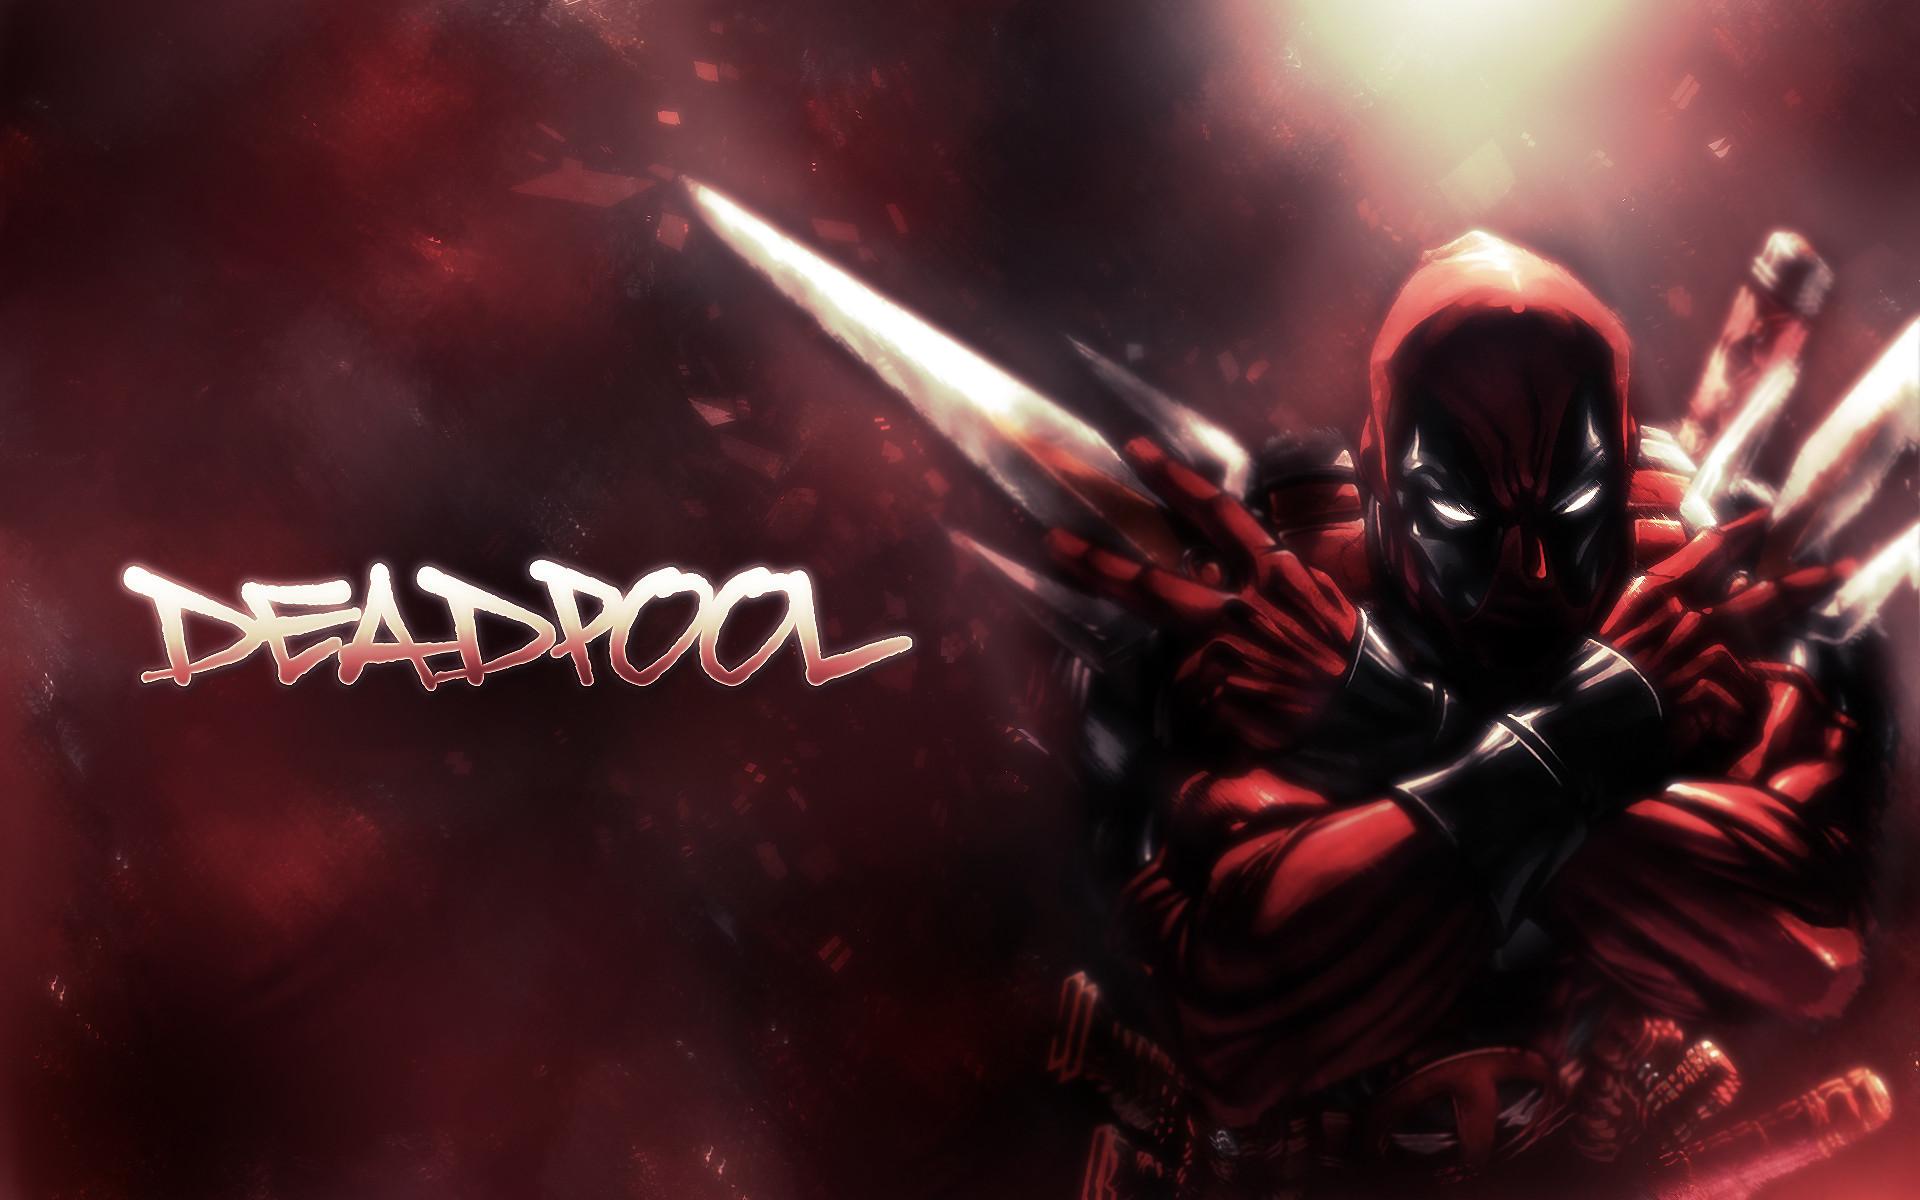 deadpool wallpaper hd backgrounds images, Cyan Mason 2017-03-07    ololoshenka   Pinterest   Deadpool free, Deadpool and Hd backgrounds